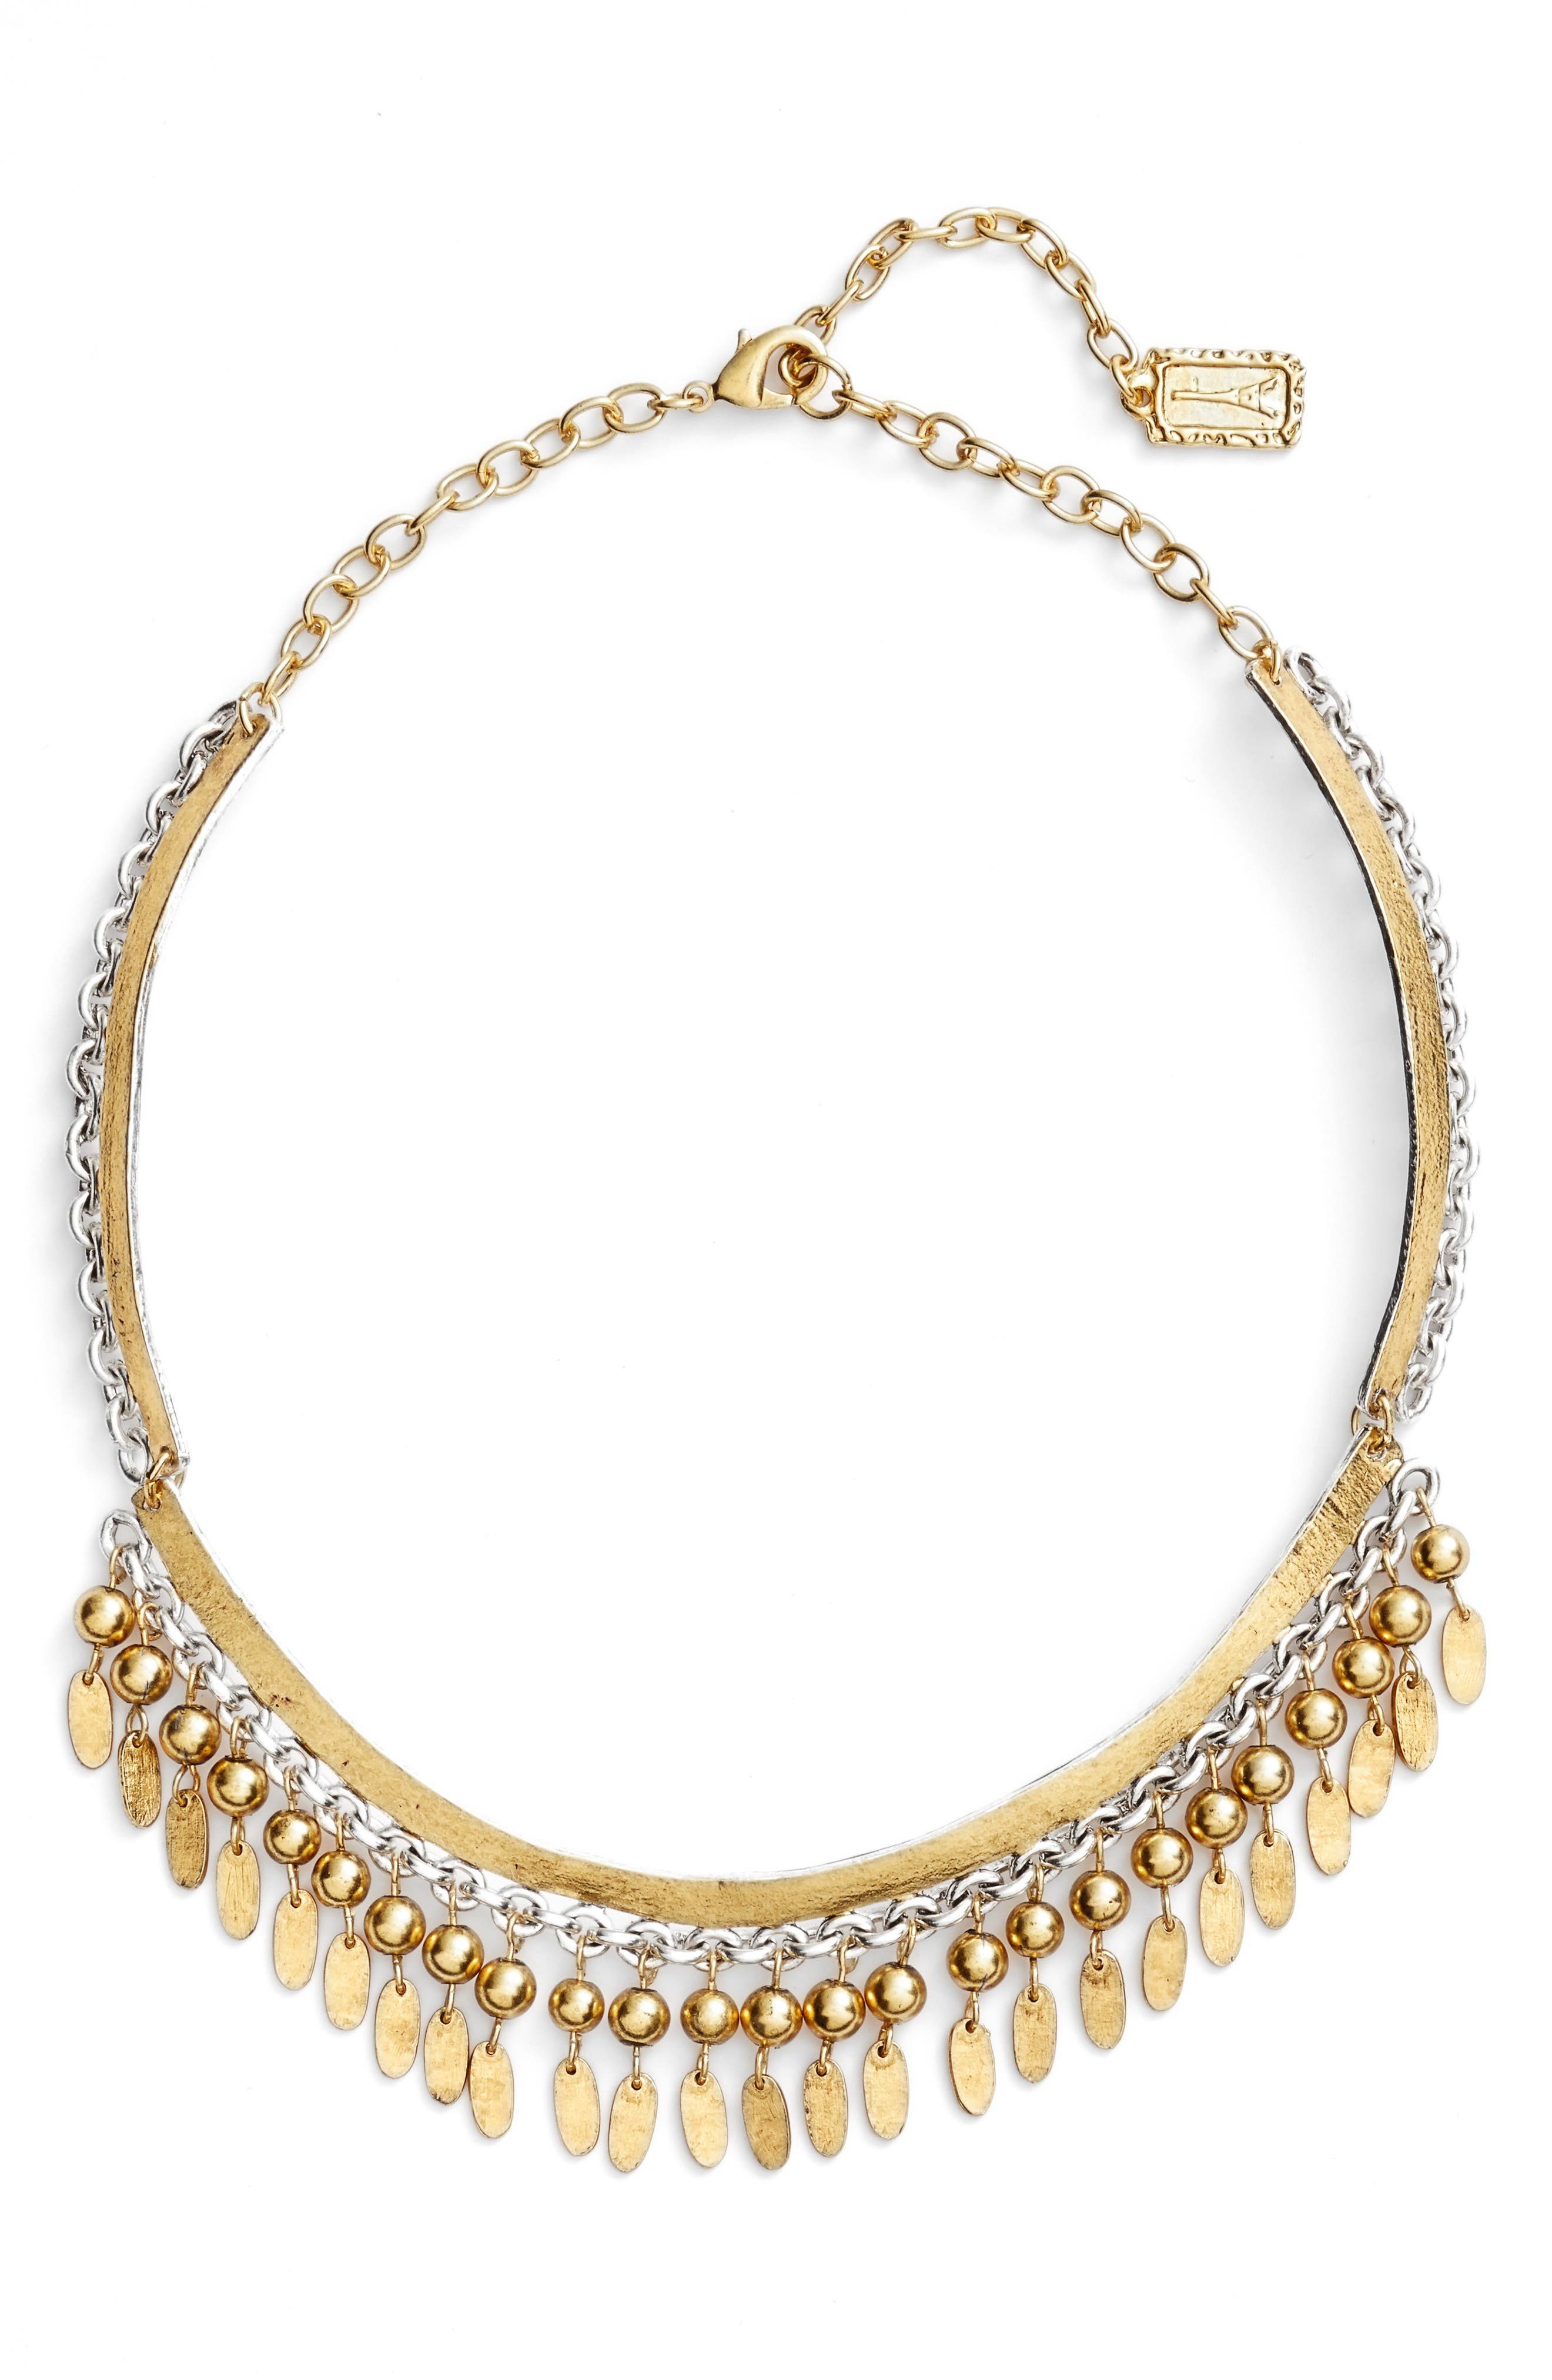 Main Image - Karine Sultan Fringe Collar Necklace